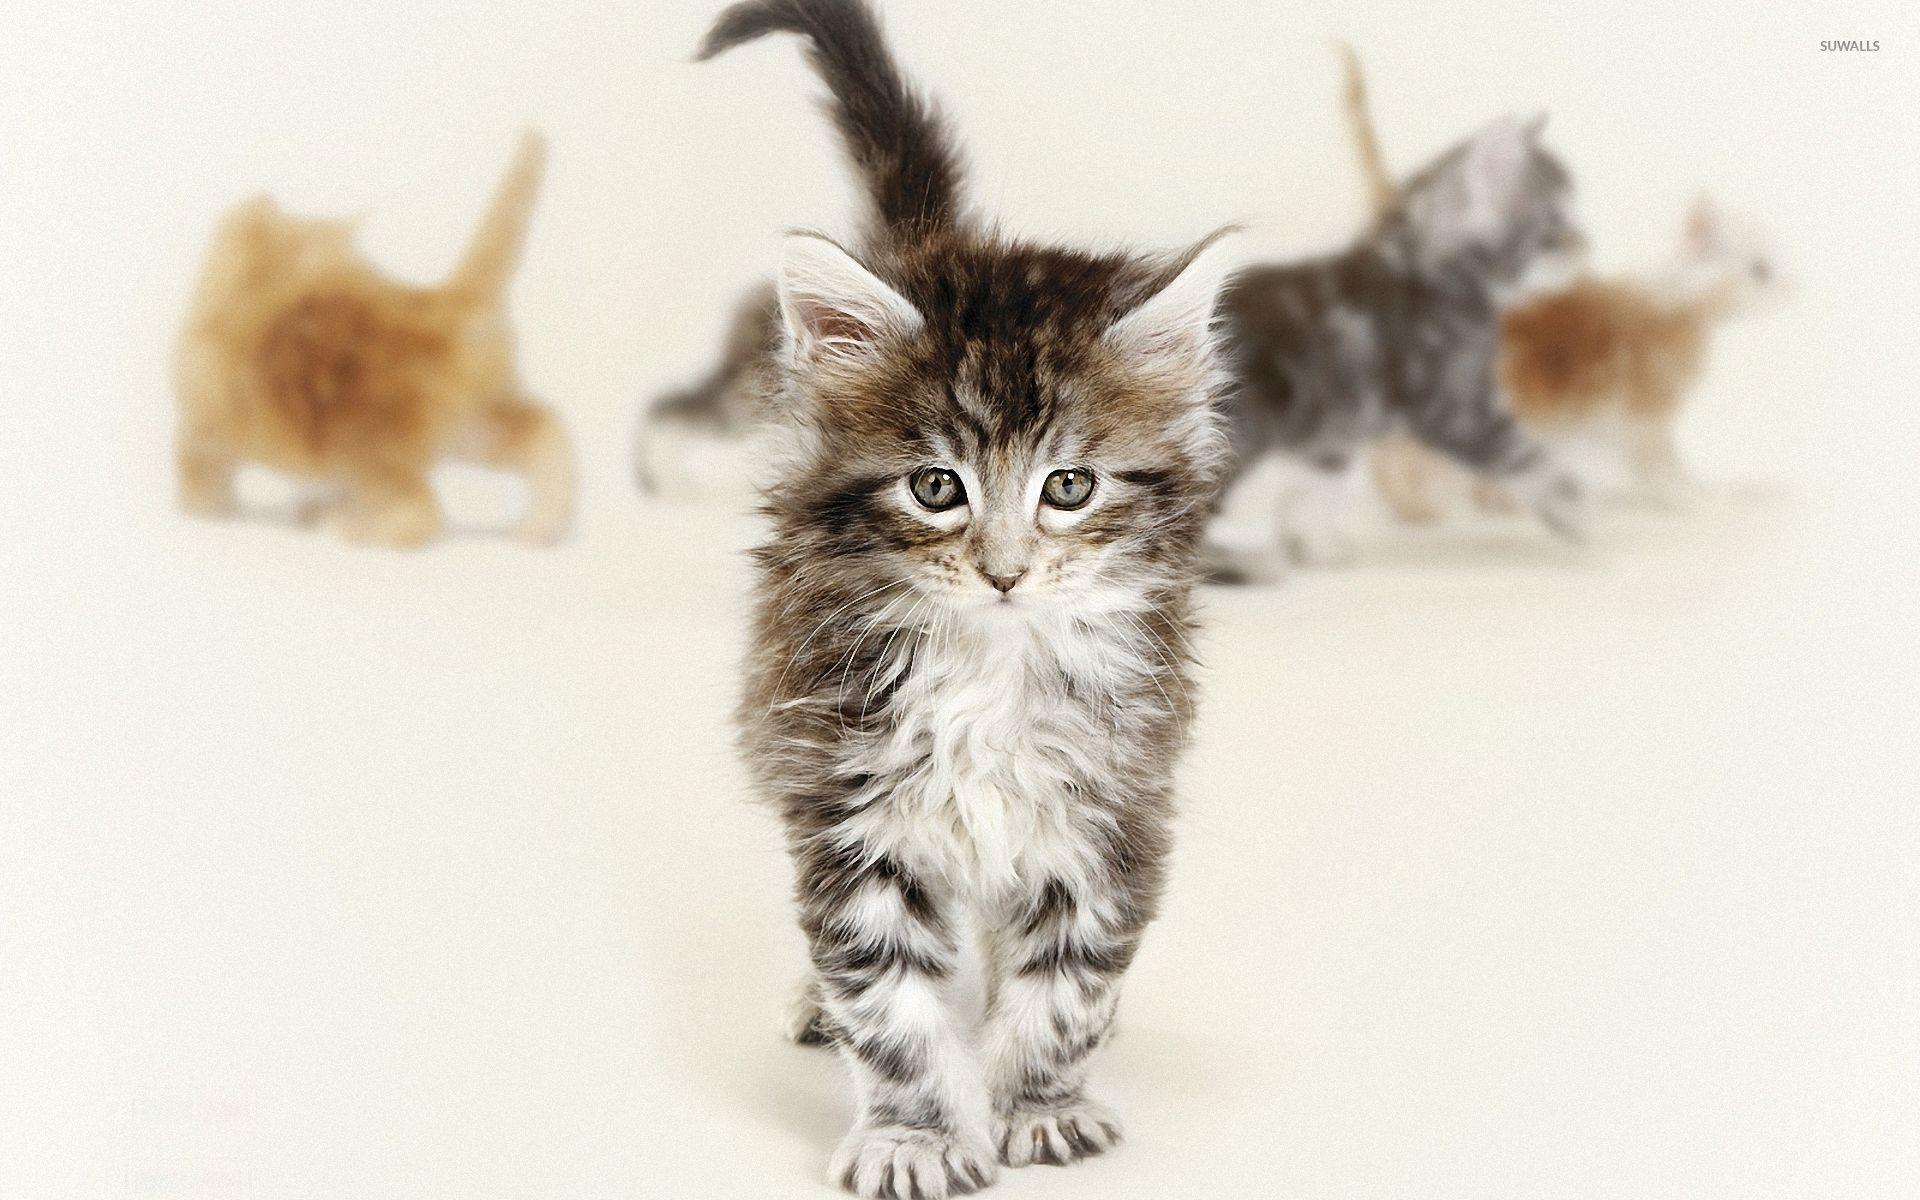 Cute fluffy kitten wallpaper - Animal